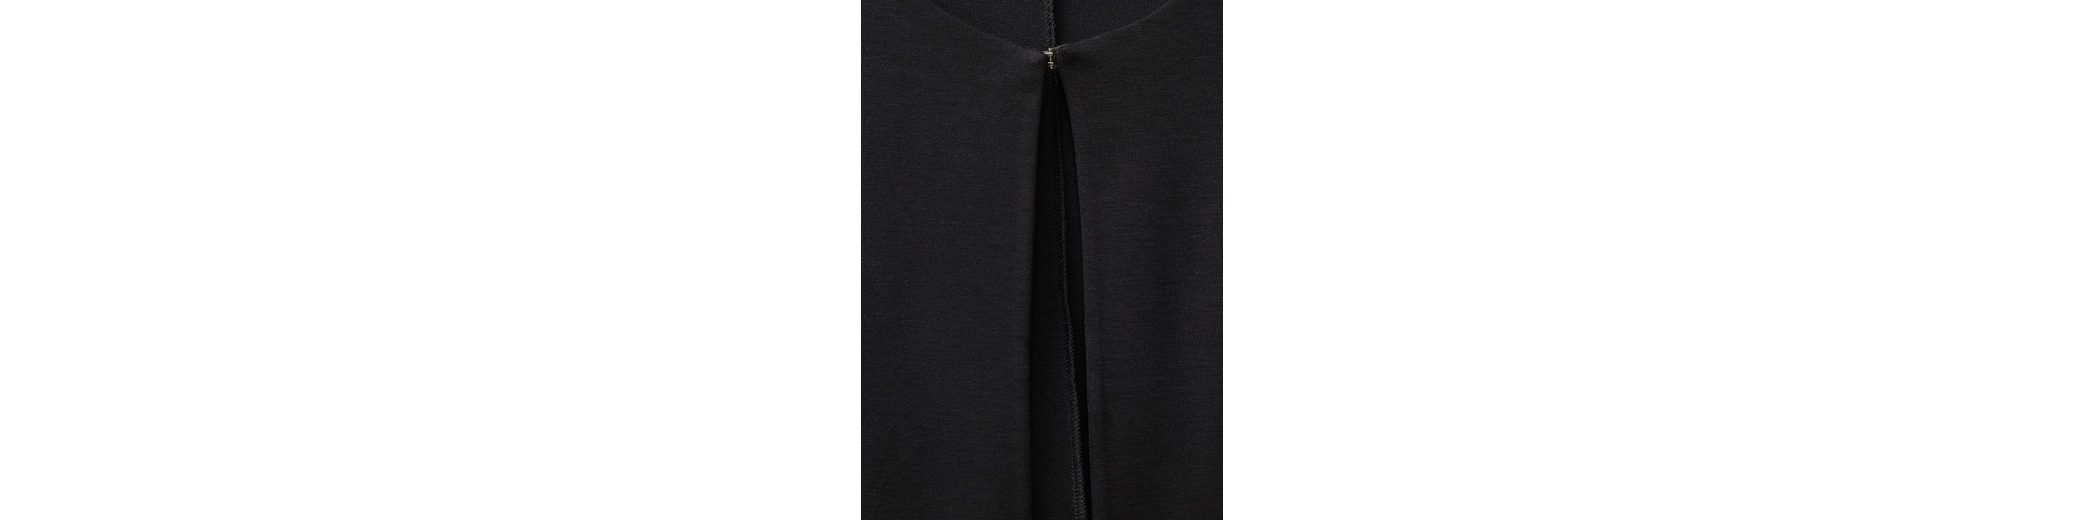 Eastbay Verkauf Online Günstig Kaufen Finish Street One Kurze Shirtjacke OkD2A25